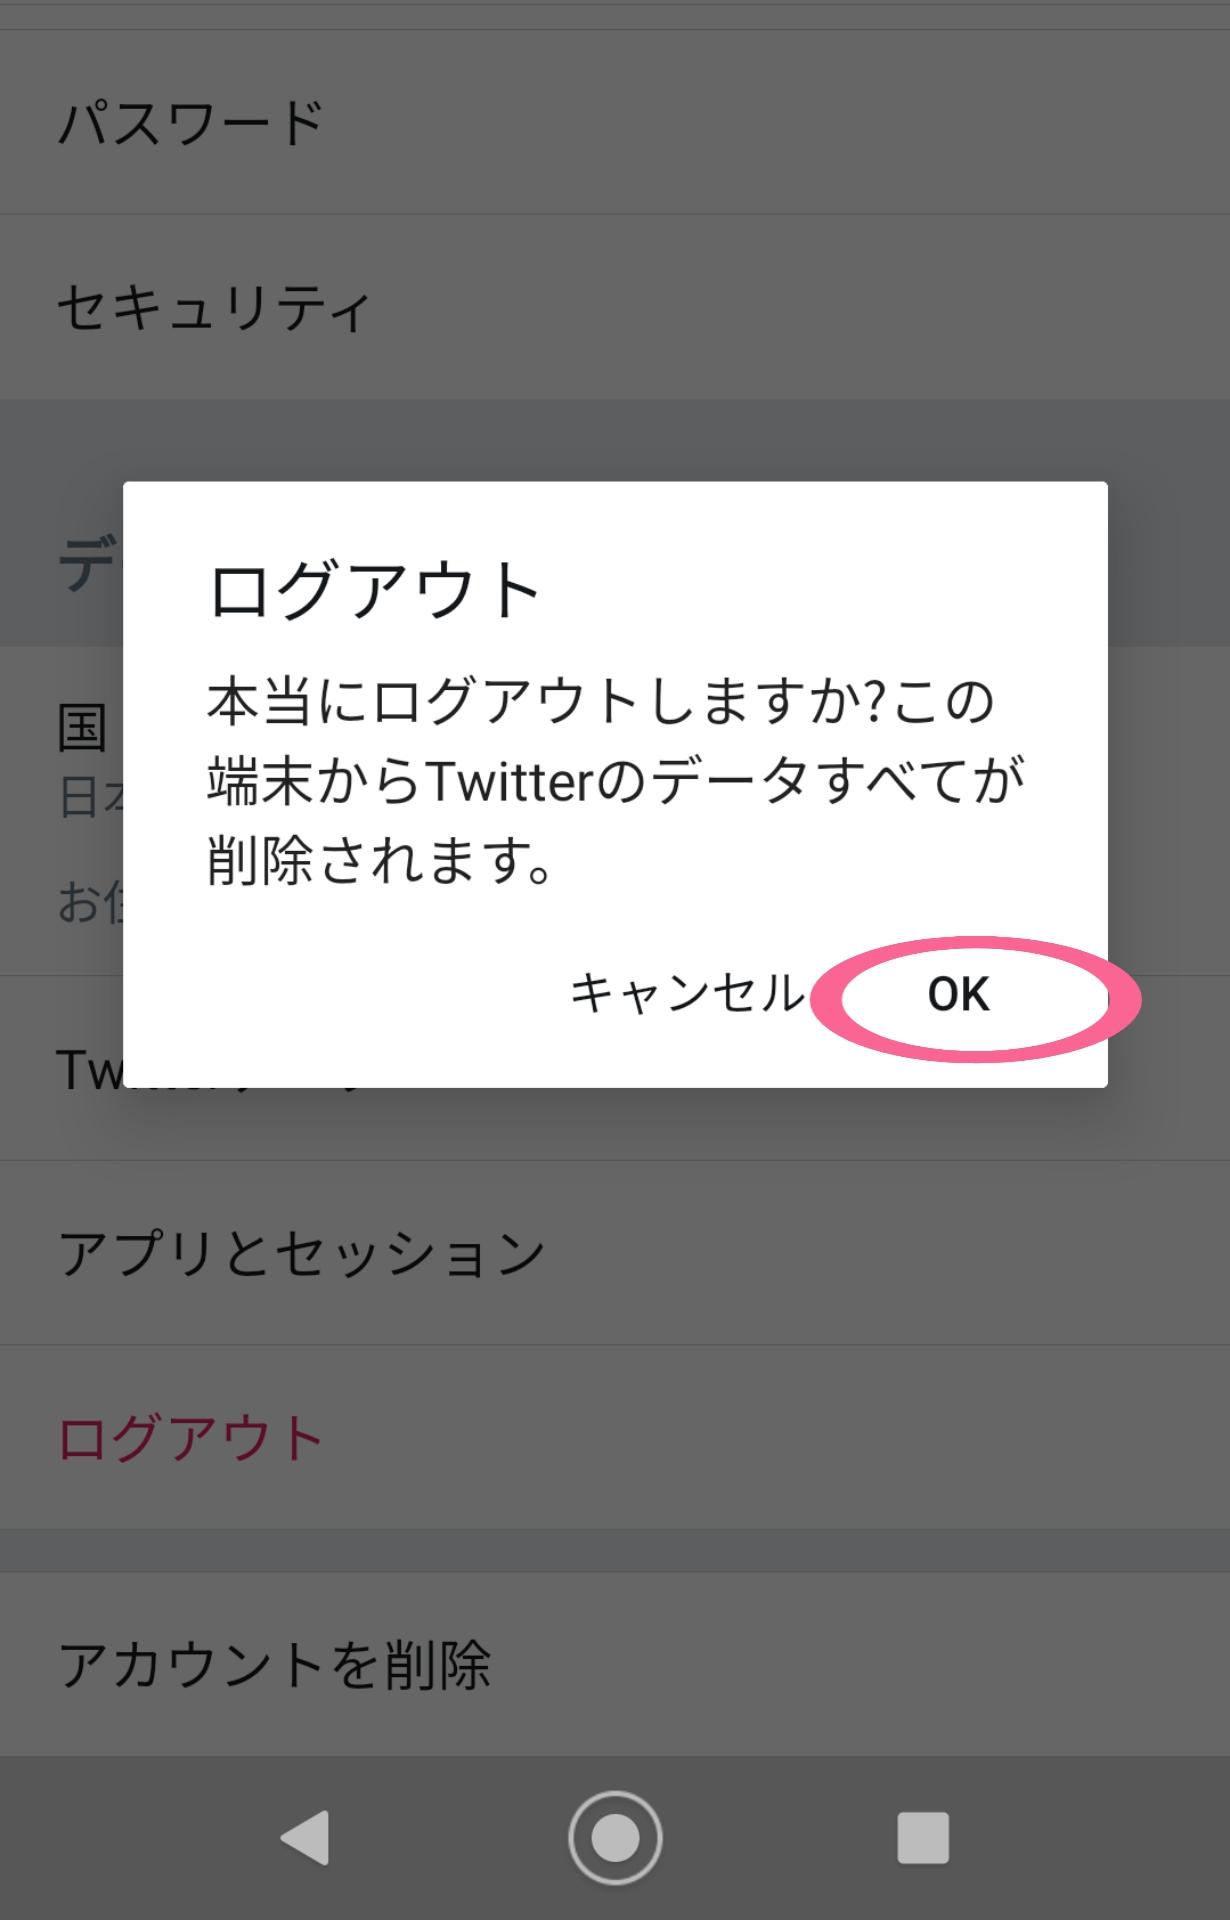 Twitter アカウント ログアウト 再確認画面 OK タップ